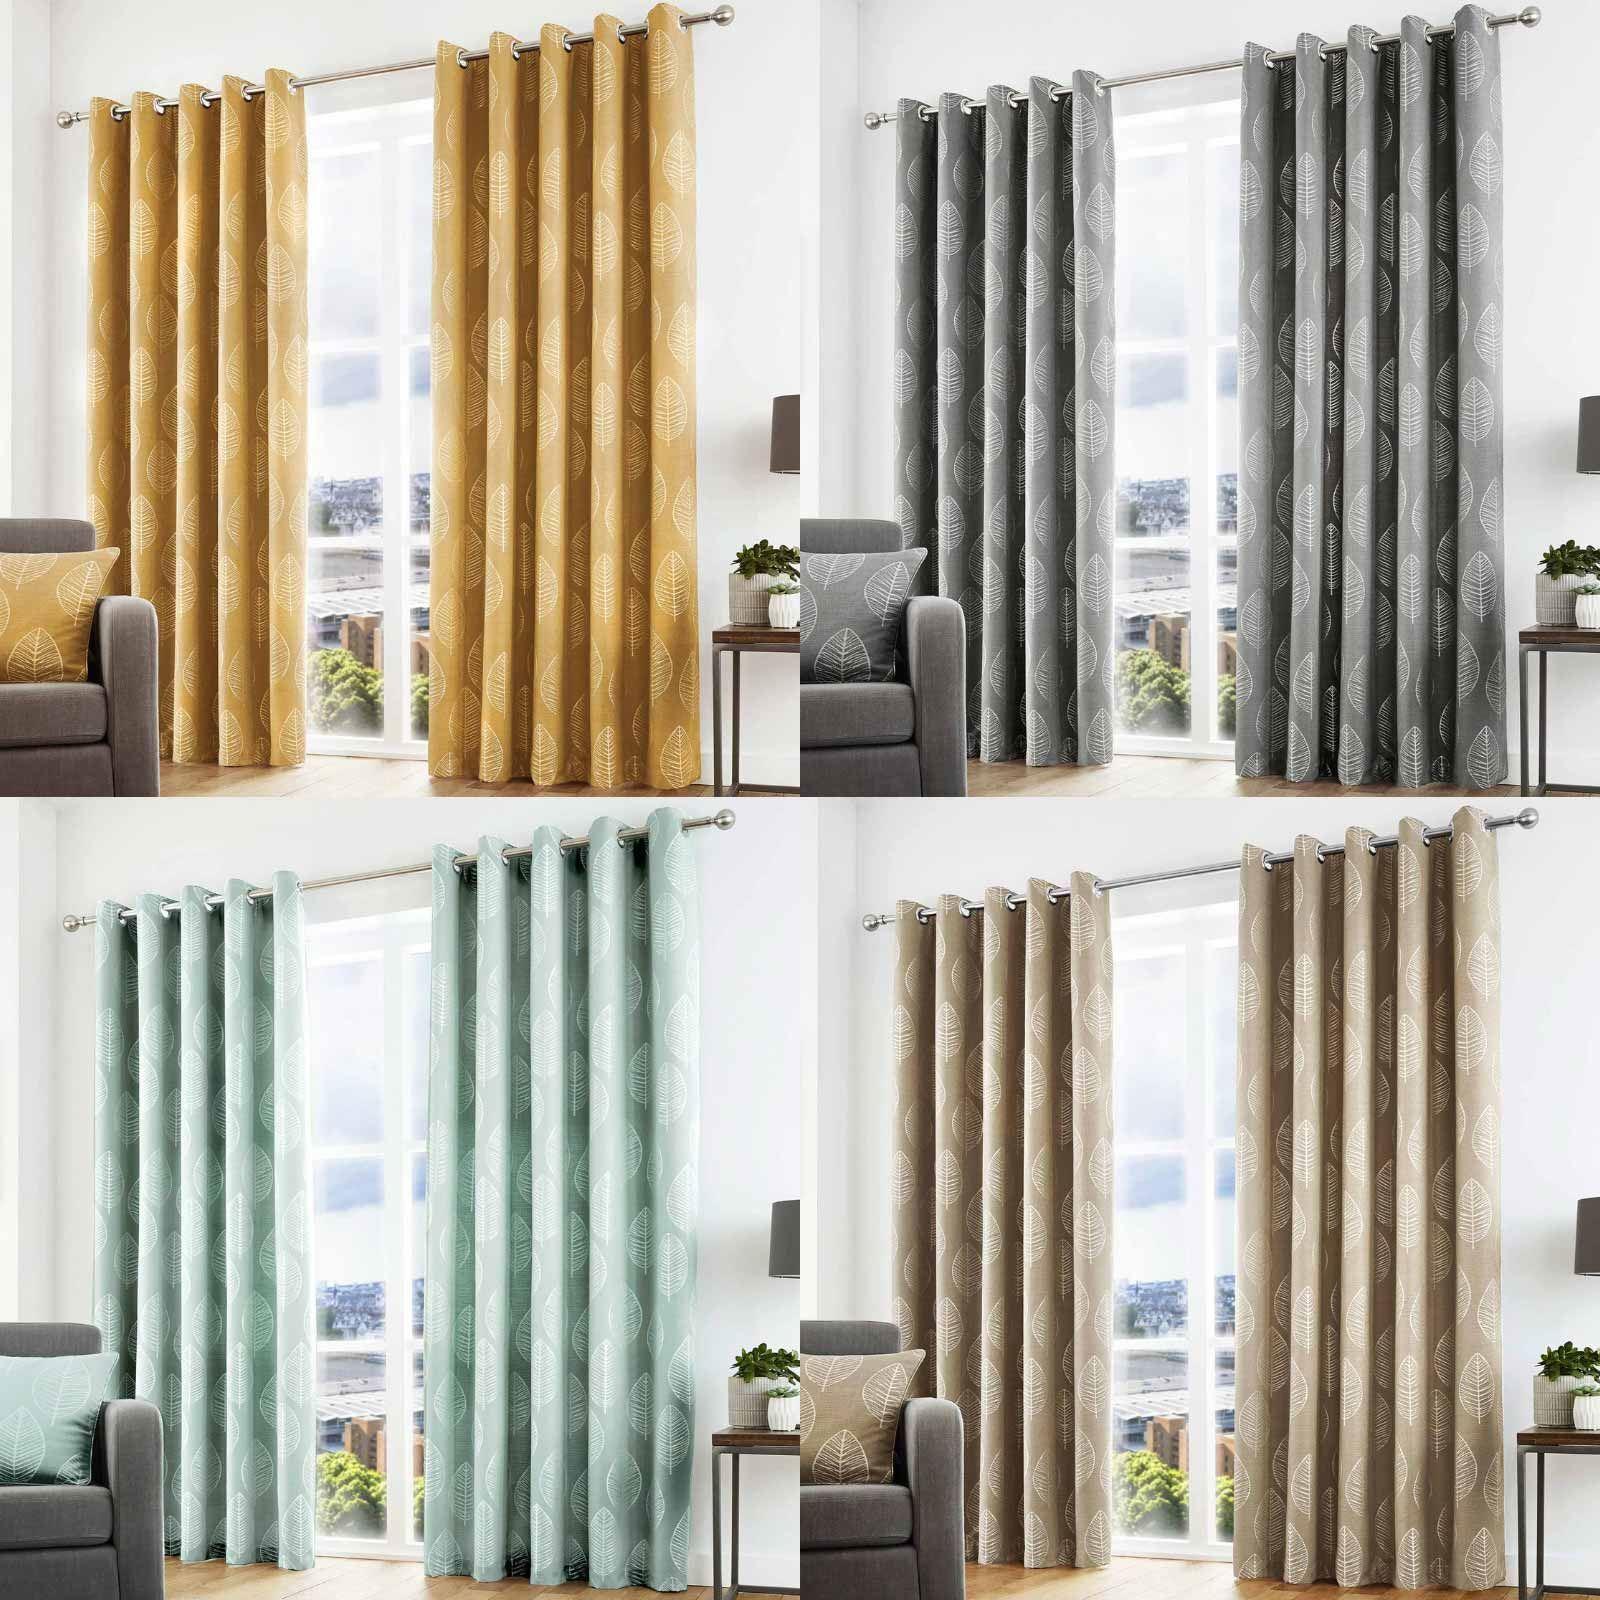 Helsinki Eyelet Curtains Jacquard Skandi Leaf Ready Made Ring Top Curtain Pairs